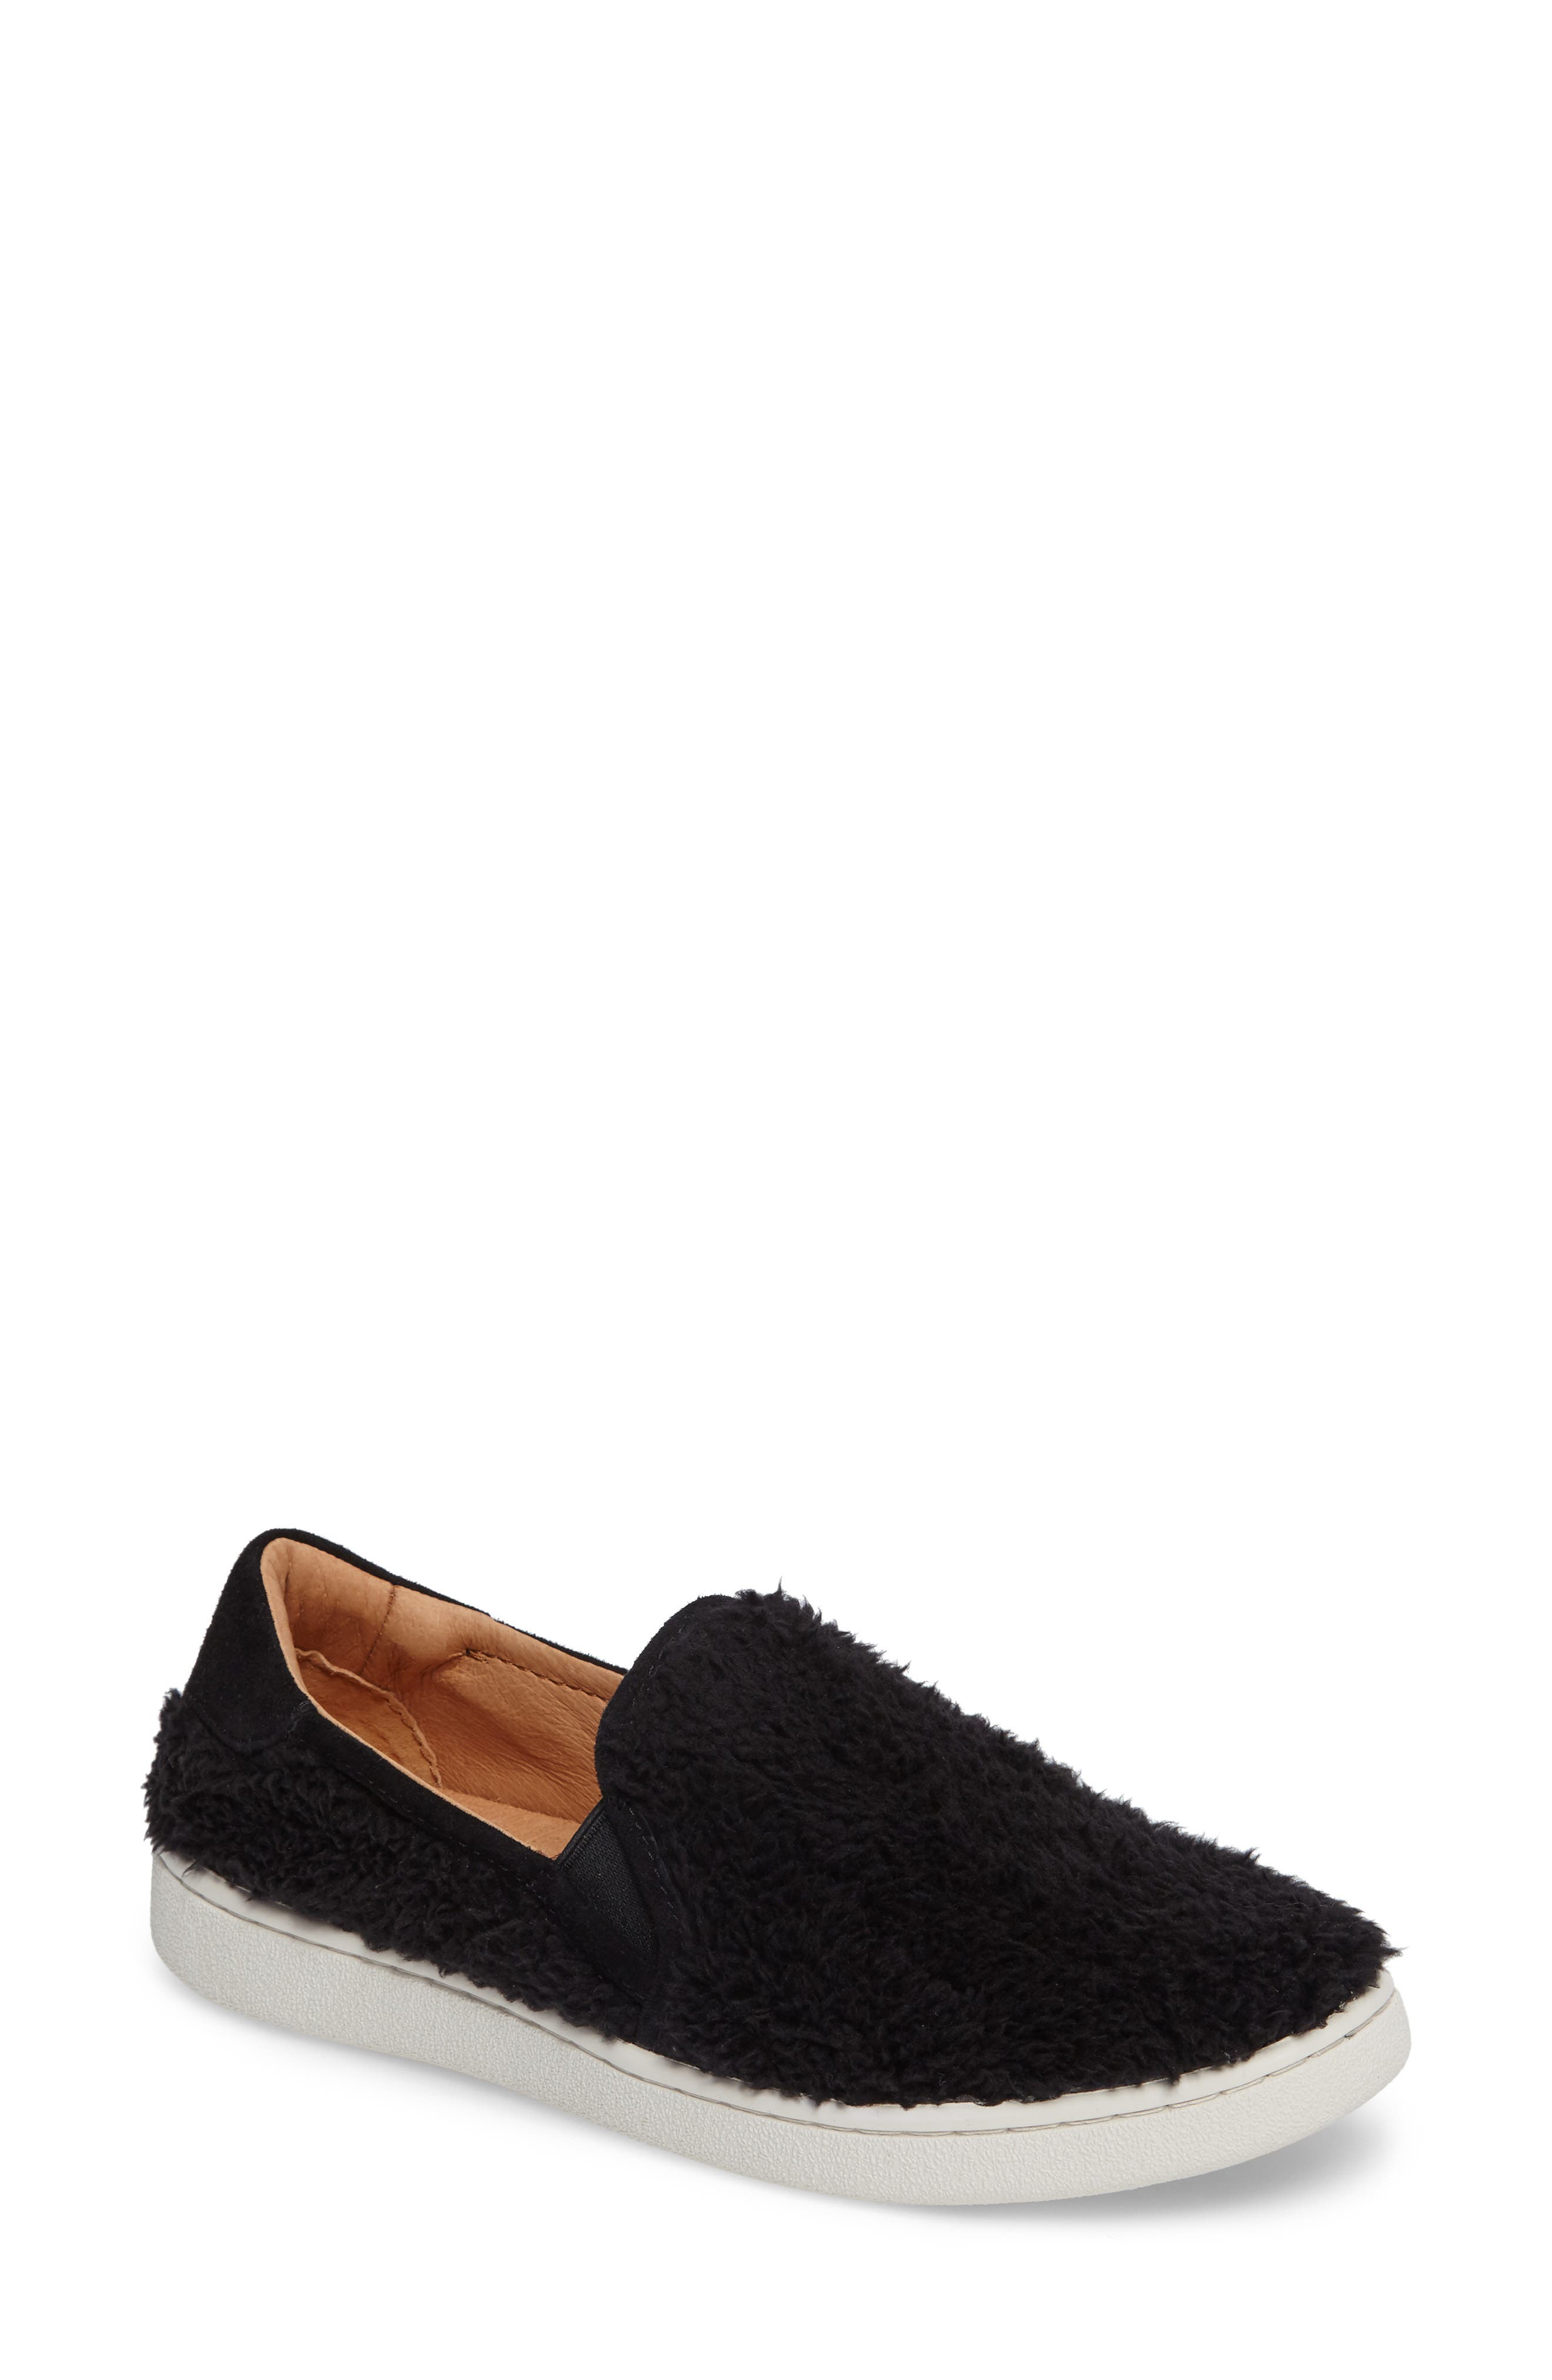 Ricci Plush Slip-On Sneaker,                         Main,                         color, 001